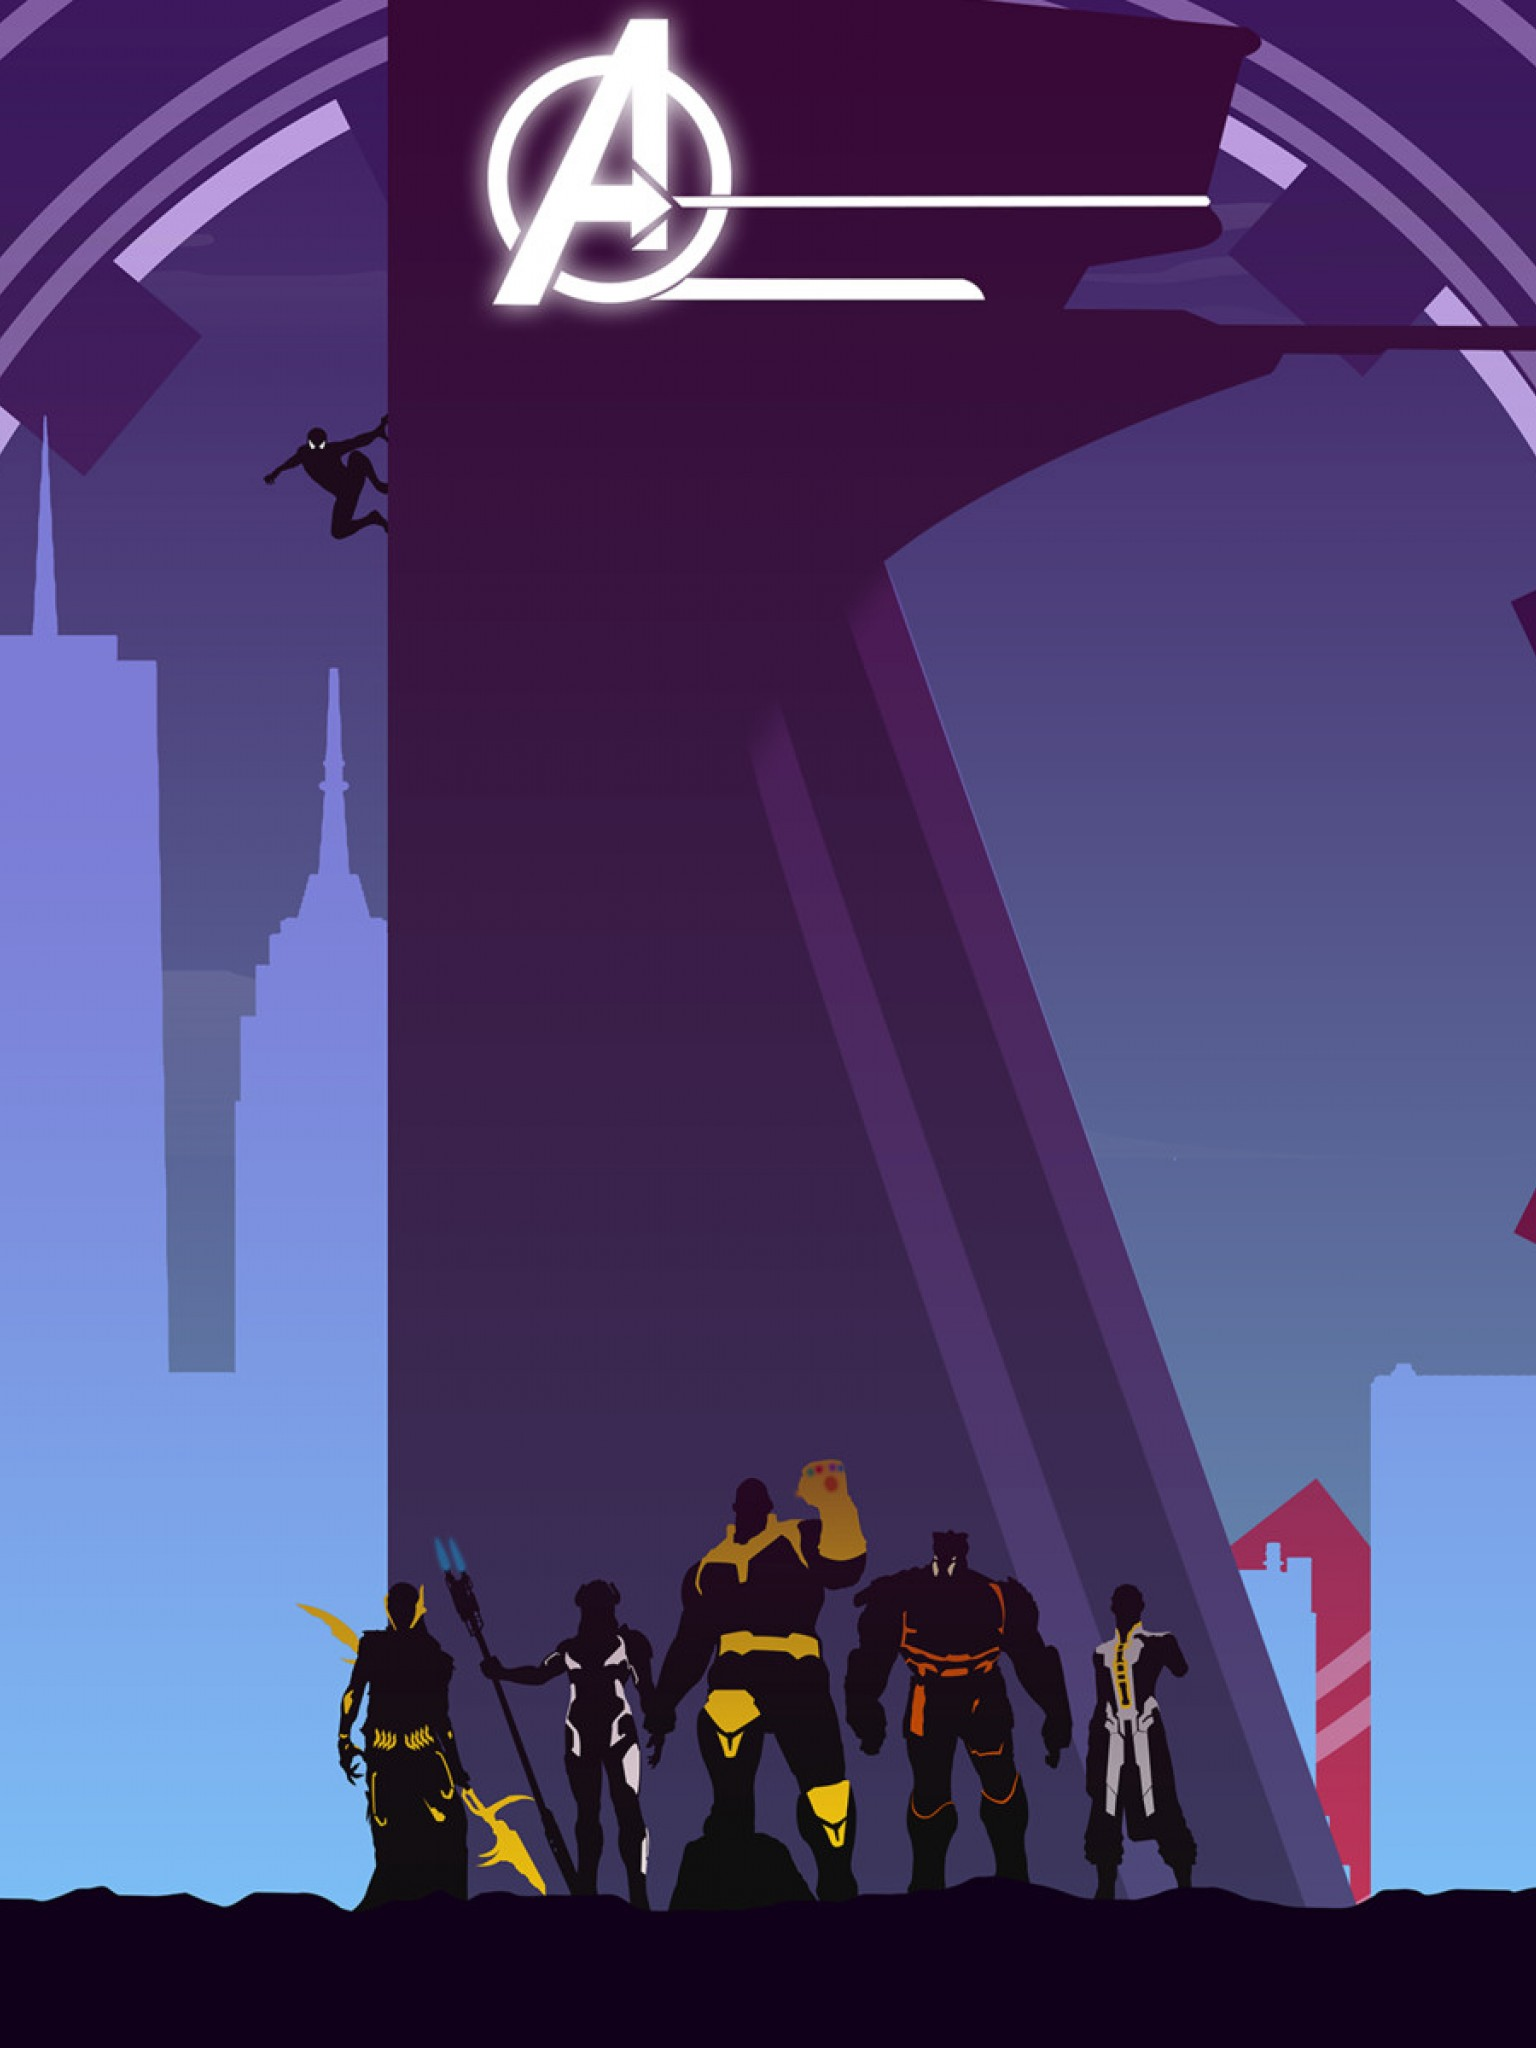 Iphone Avengers Wallpaper 4k 1536x2048 Wallpaper Teahub Io